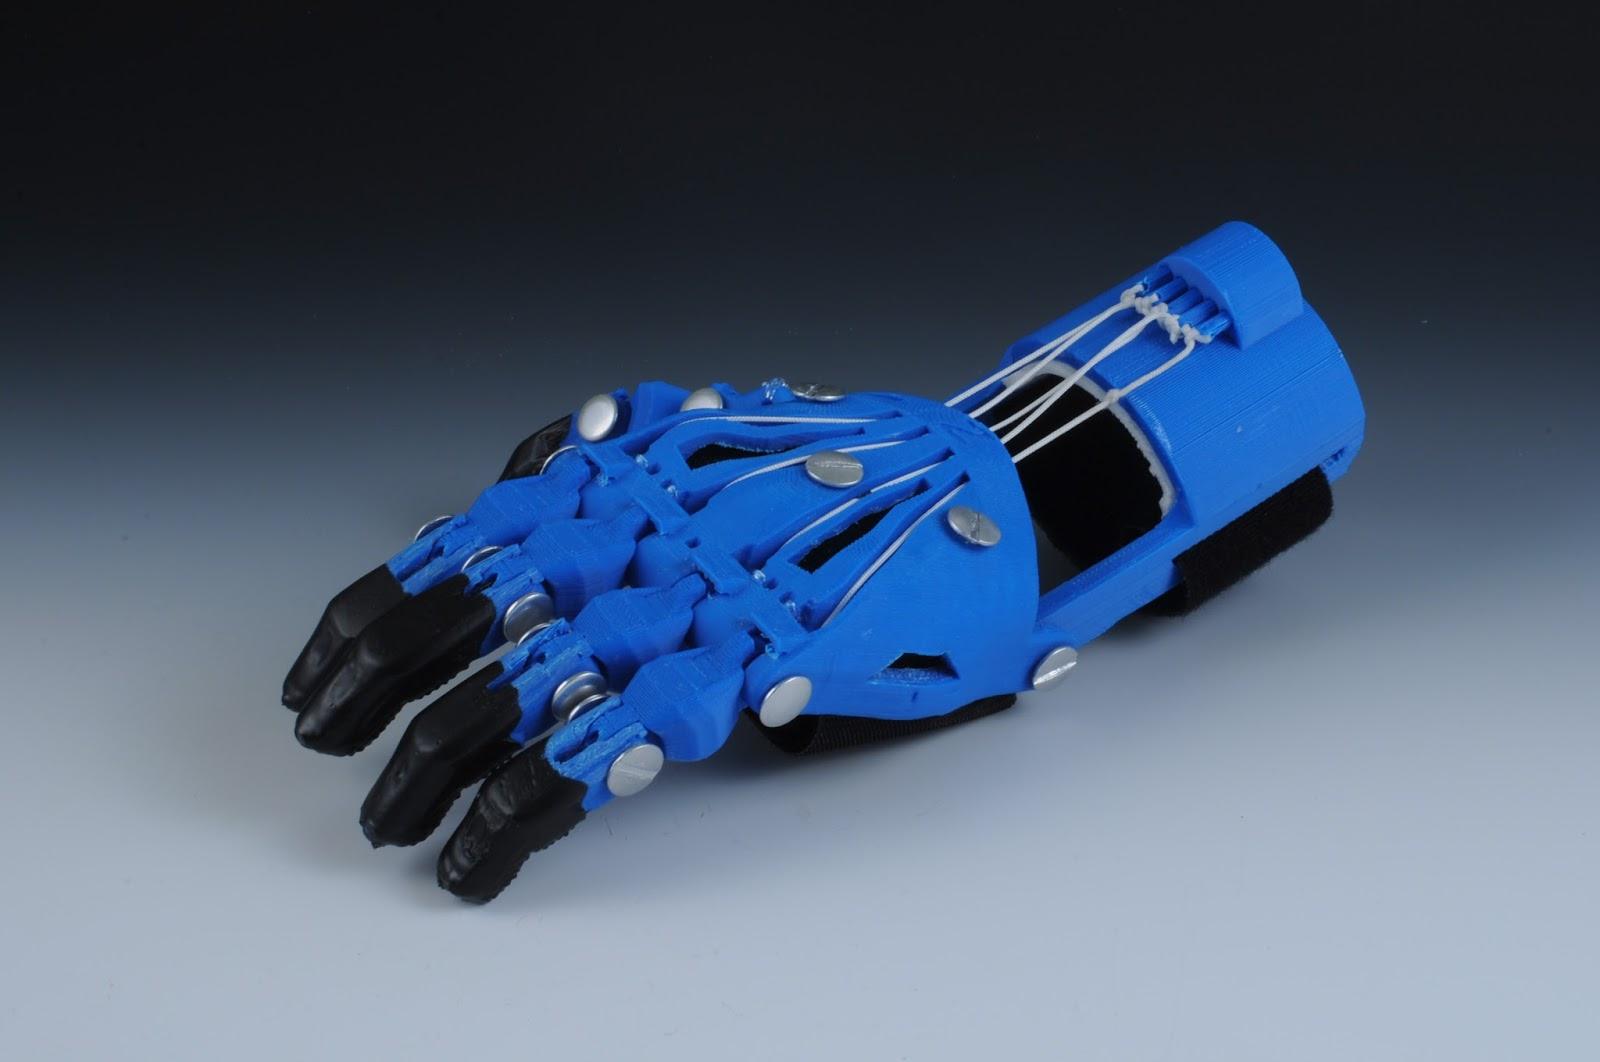 handverker: karuna's short gauntlet beast